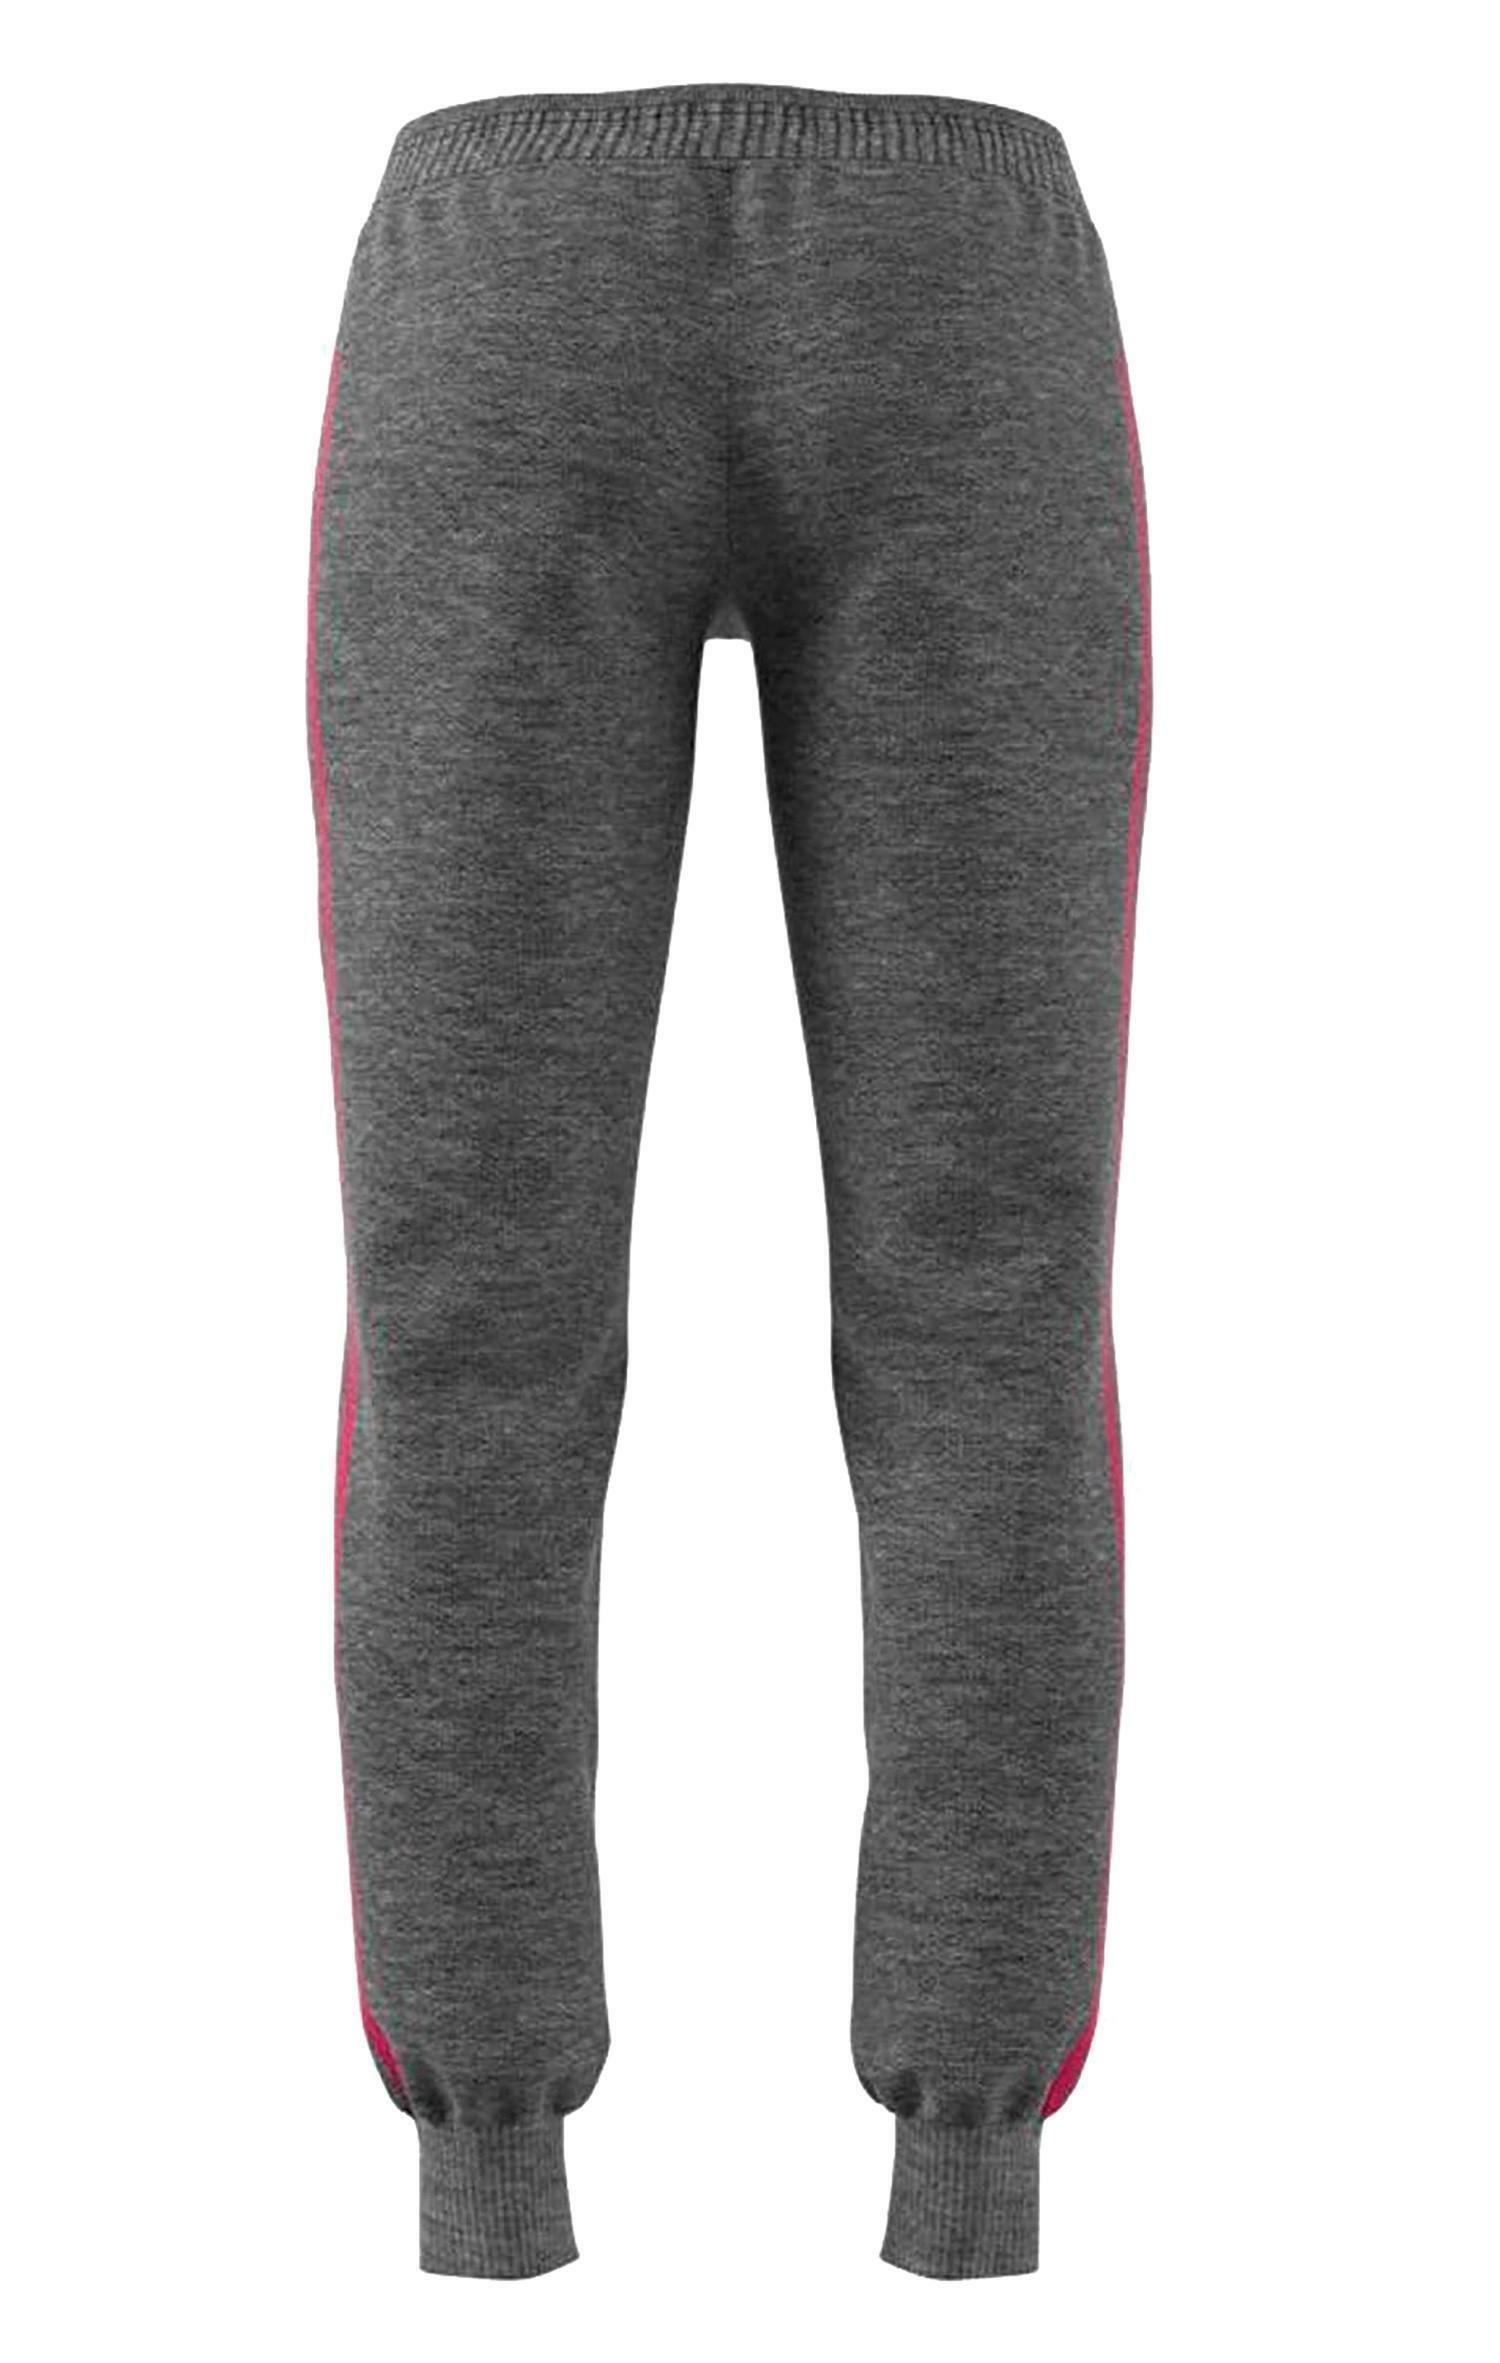 adidas adidas pantaloni tuta donna grigi cz5749